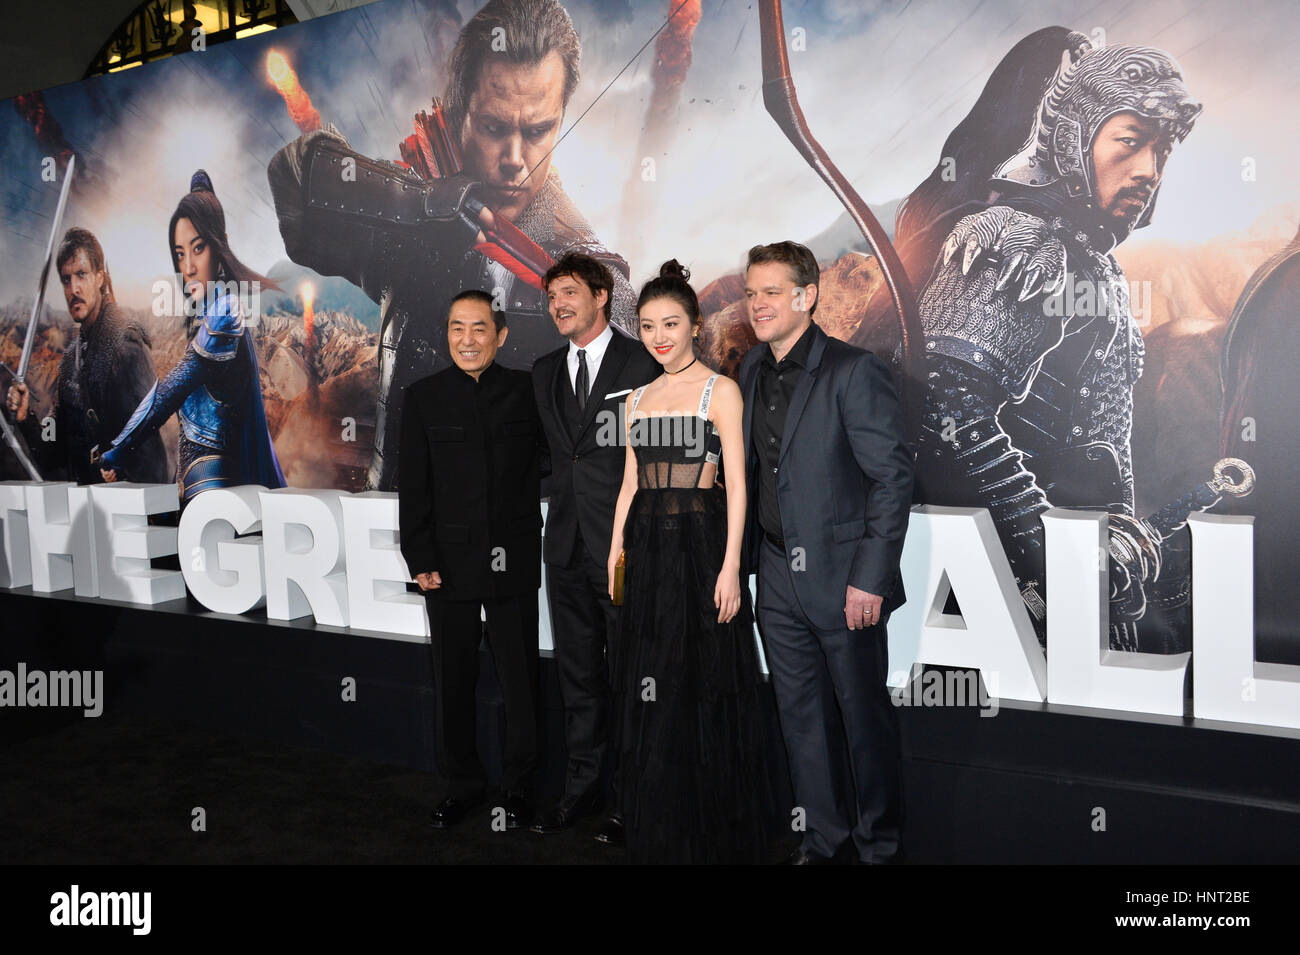 Los Angeles, USA. 15. Februar 2017. Regisseur Yimou Zhang, Schauspieler Pedro Pascal, Jing Tian & Matt Damon Stockbild